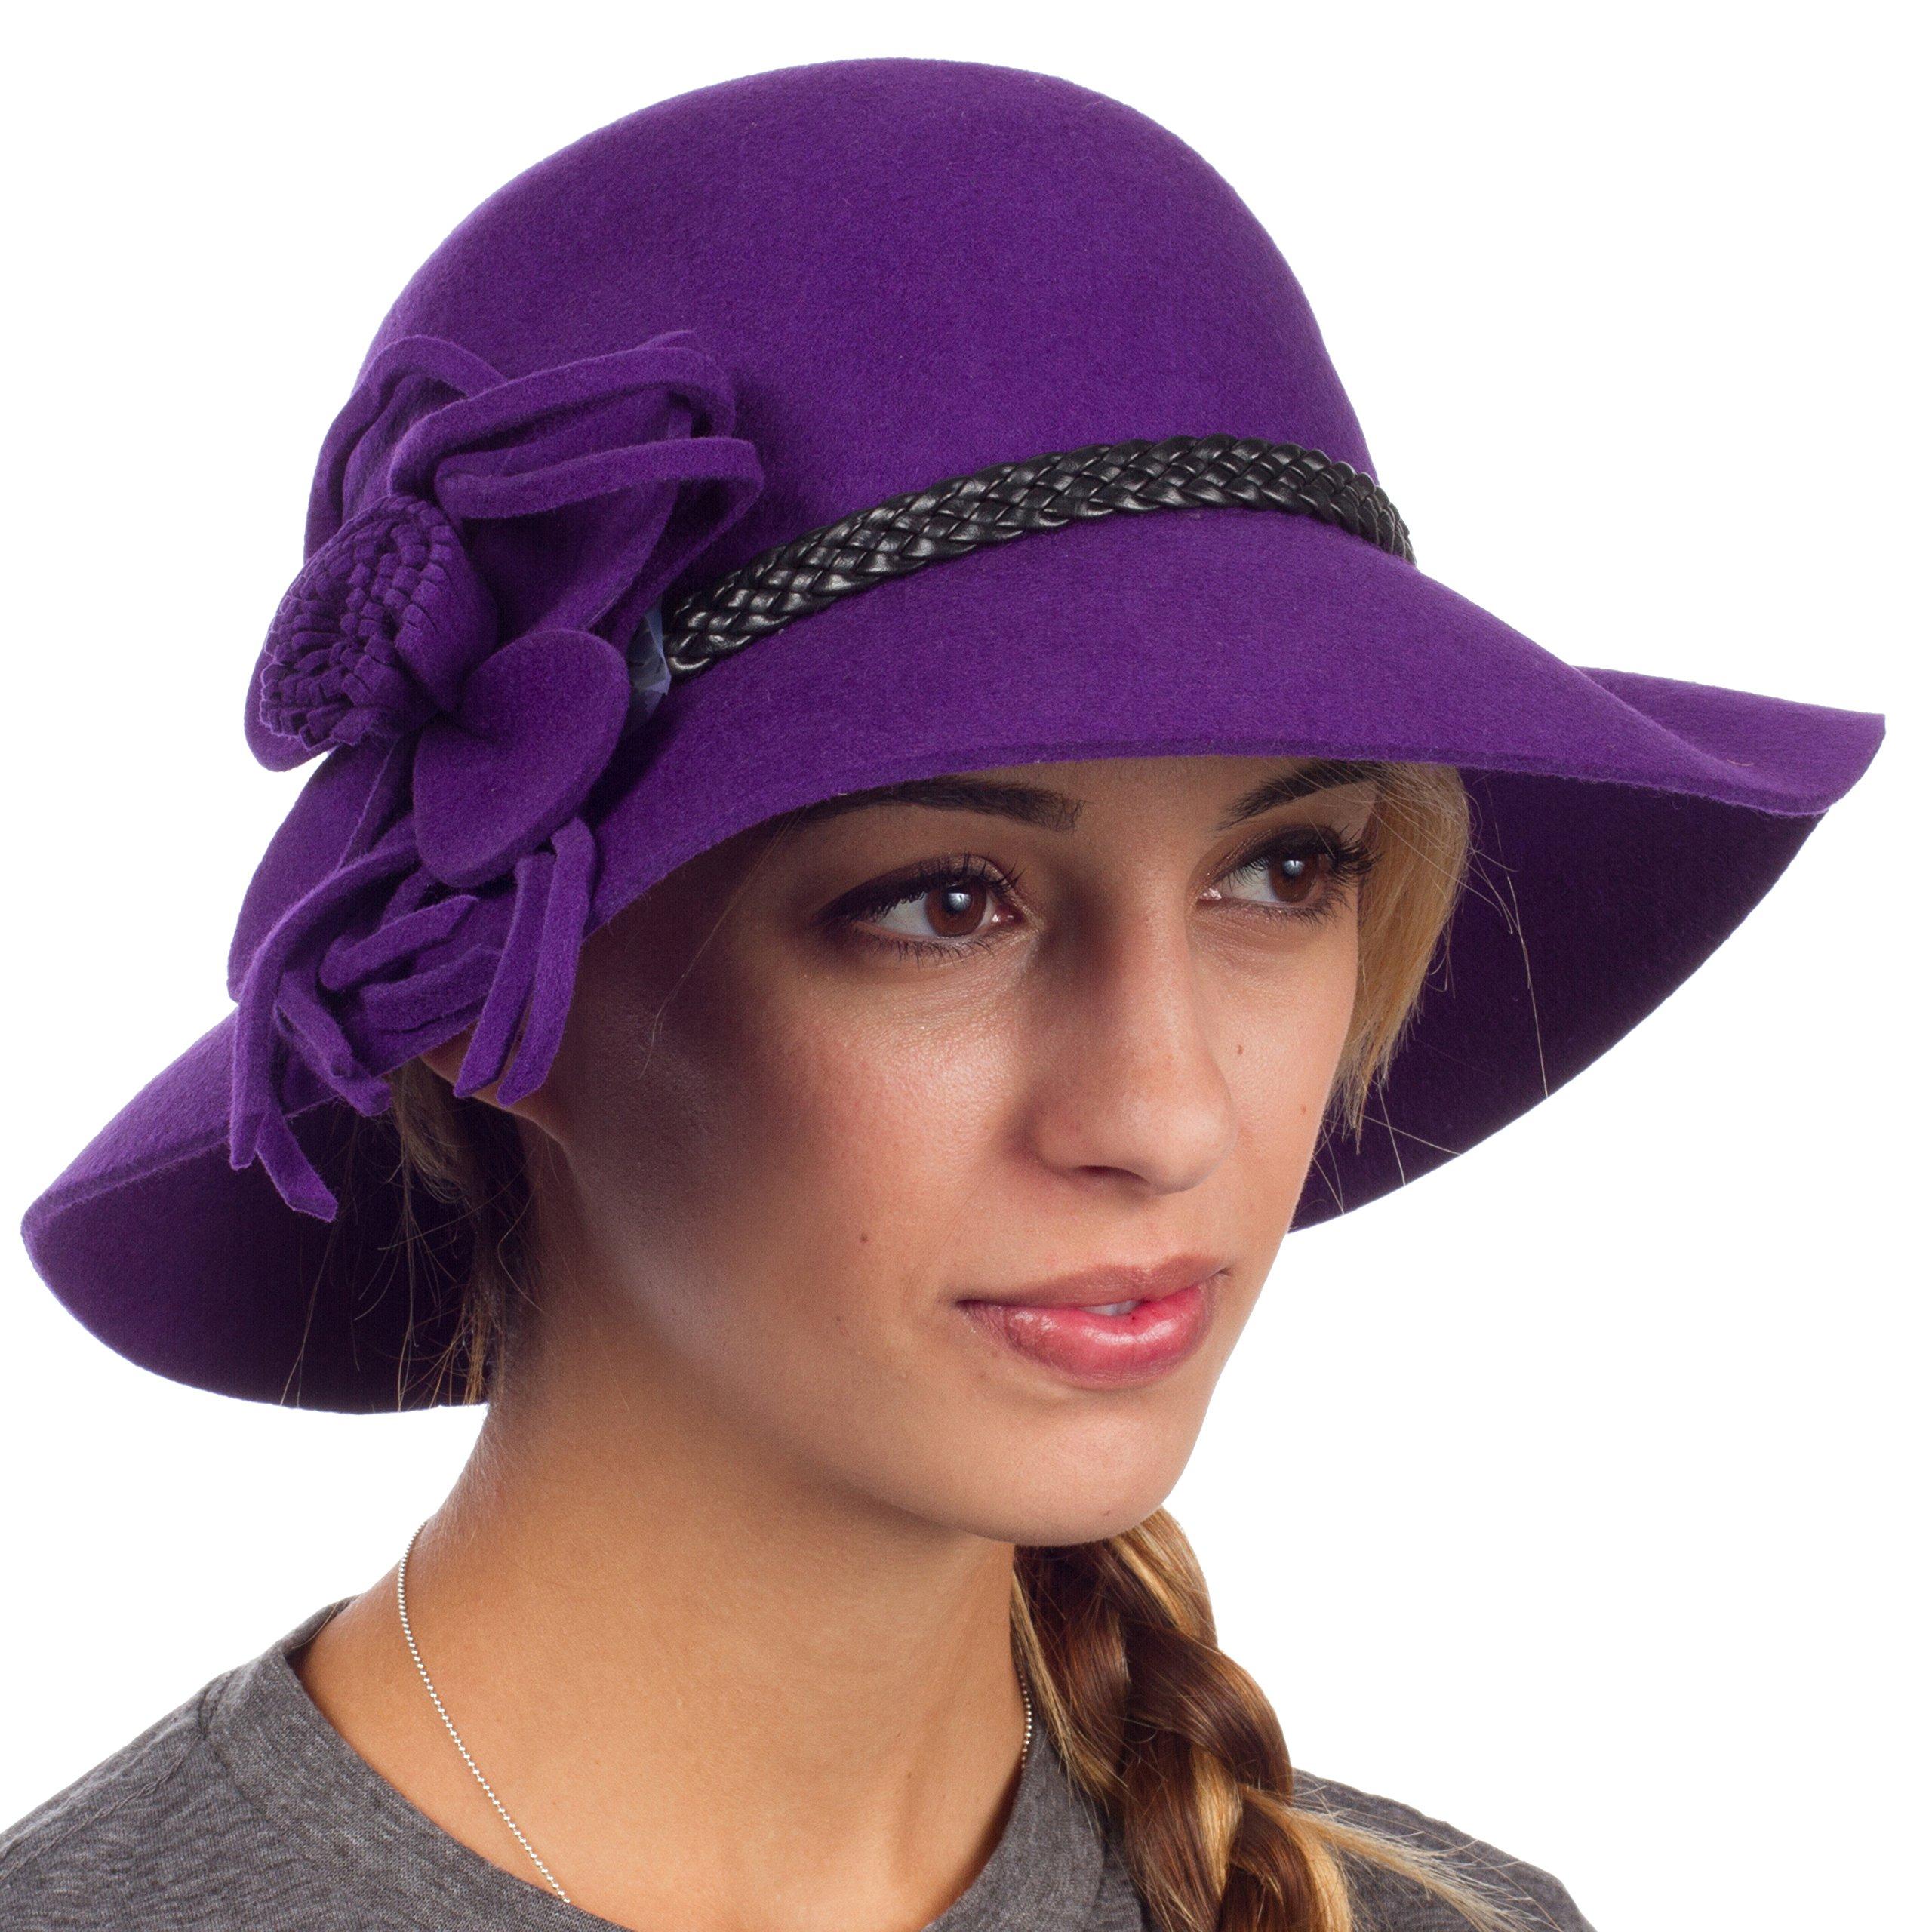 Sakkas 30M Gloria Vintage Style Wool Cloche Hat - Purple - One Size